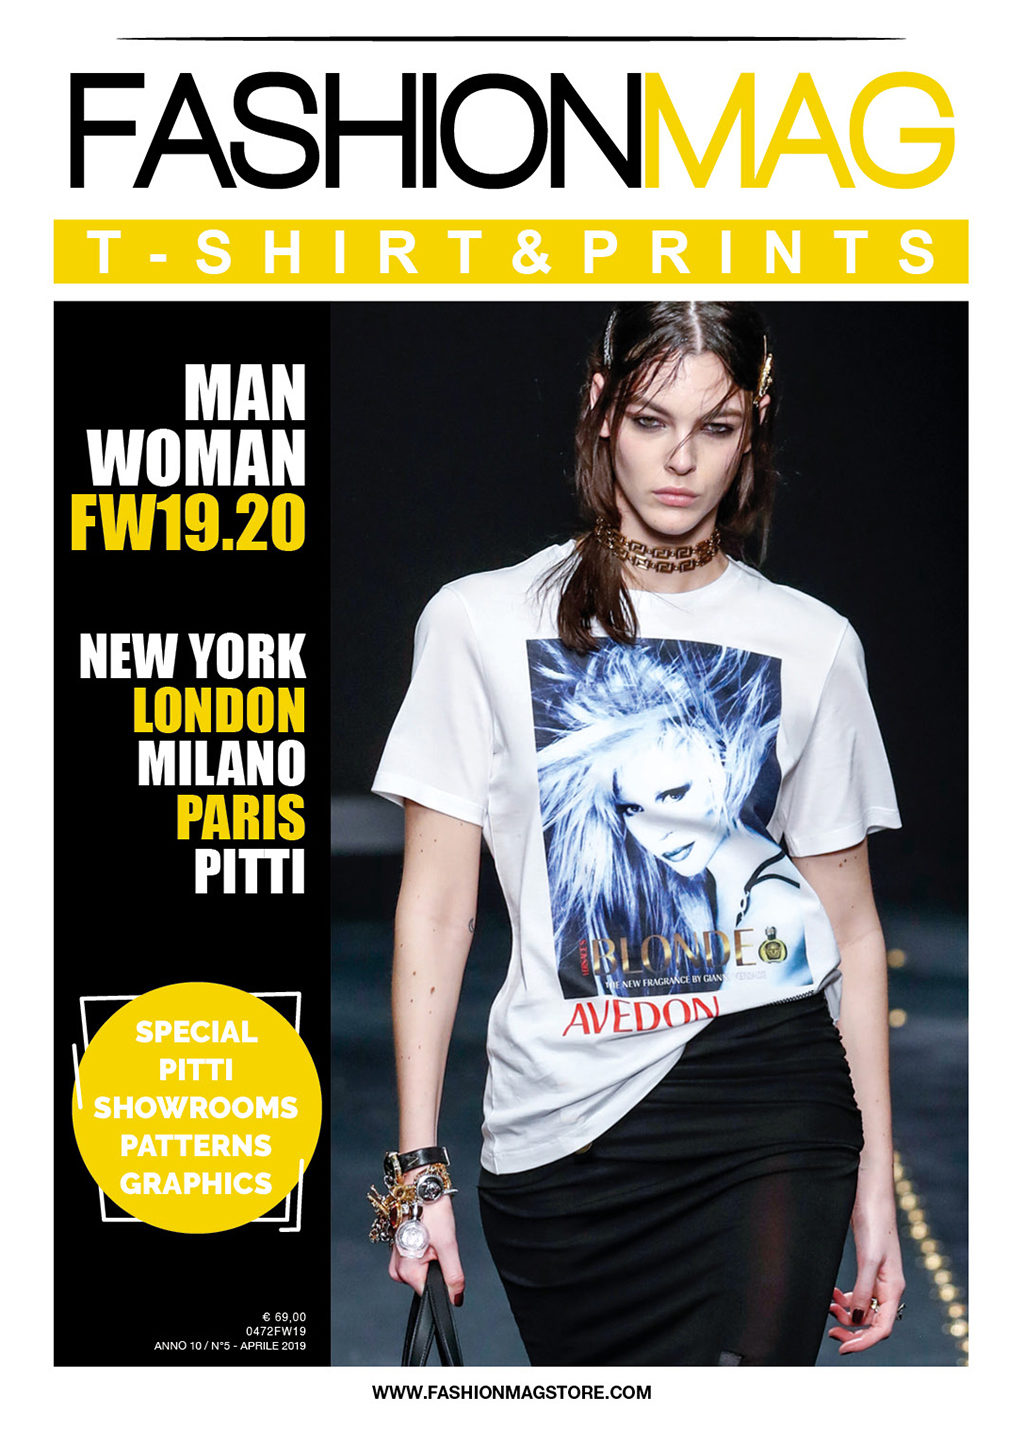 d5c7bb2e8a1 FASHIONMAG T-SHIRT&PRINTS FW 19.20 | Showdetails